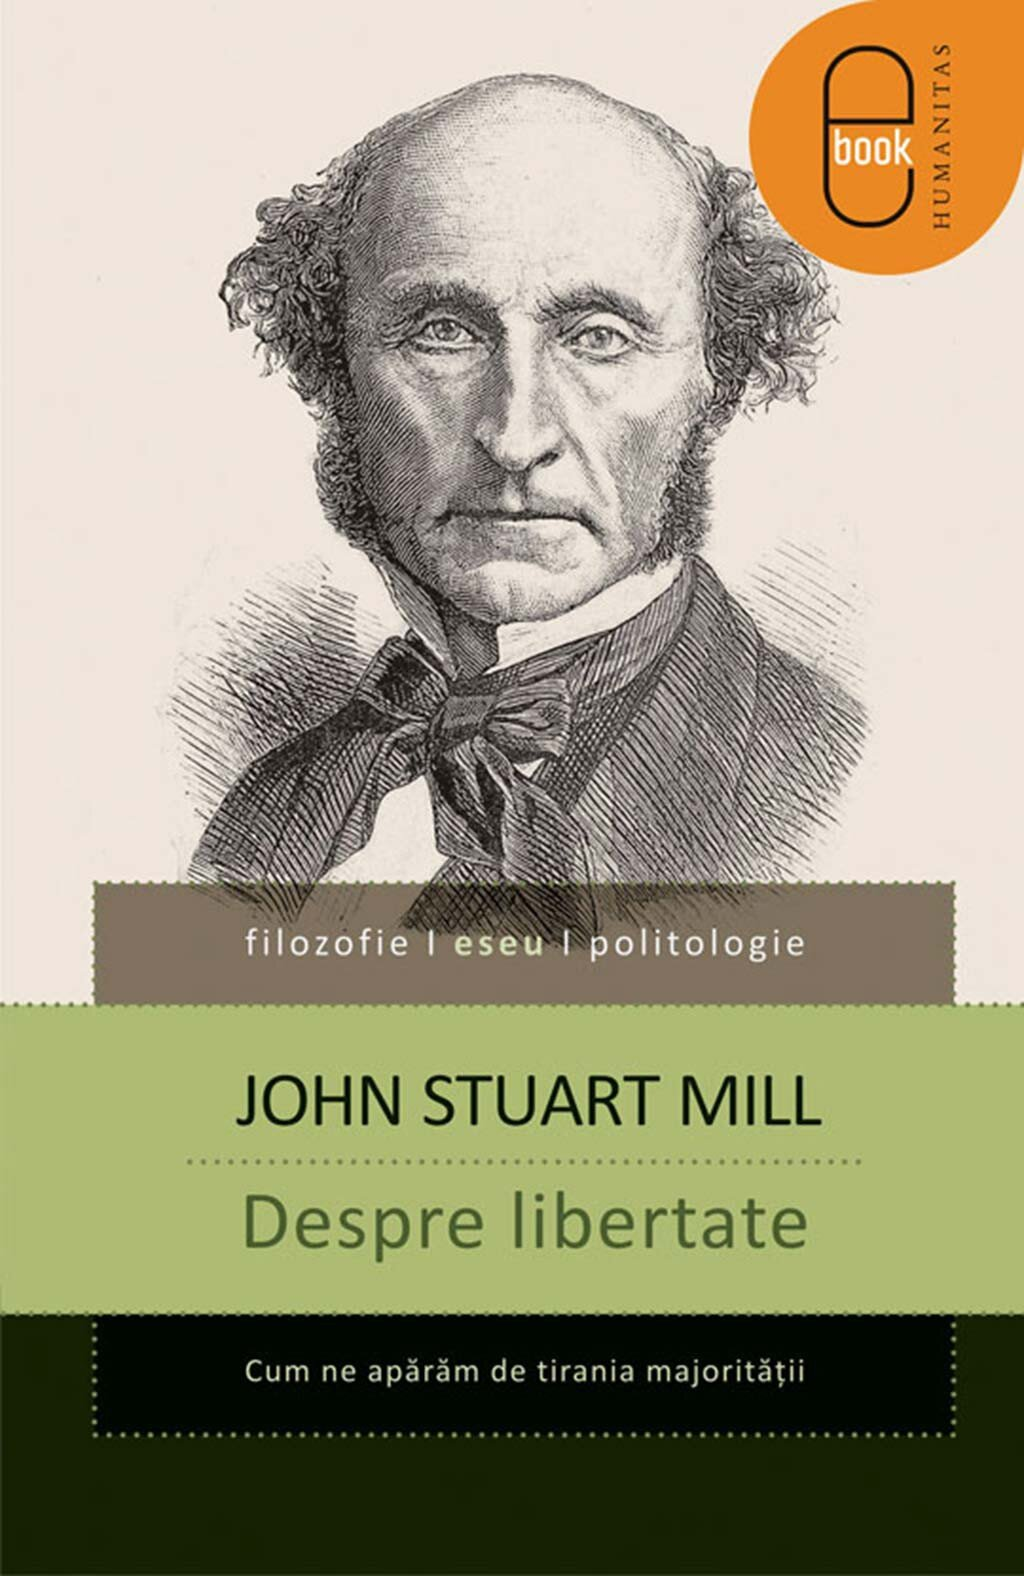 Despre libertate. Cum ne aparam de tirania majoritatii (eBook)